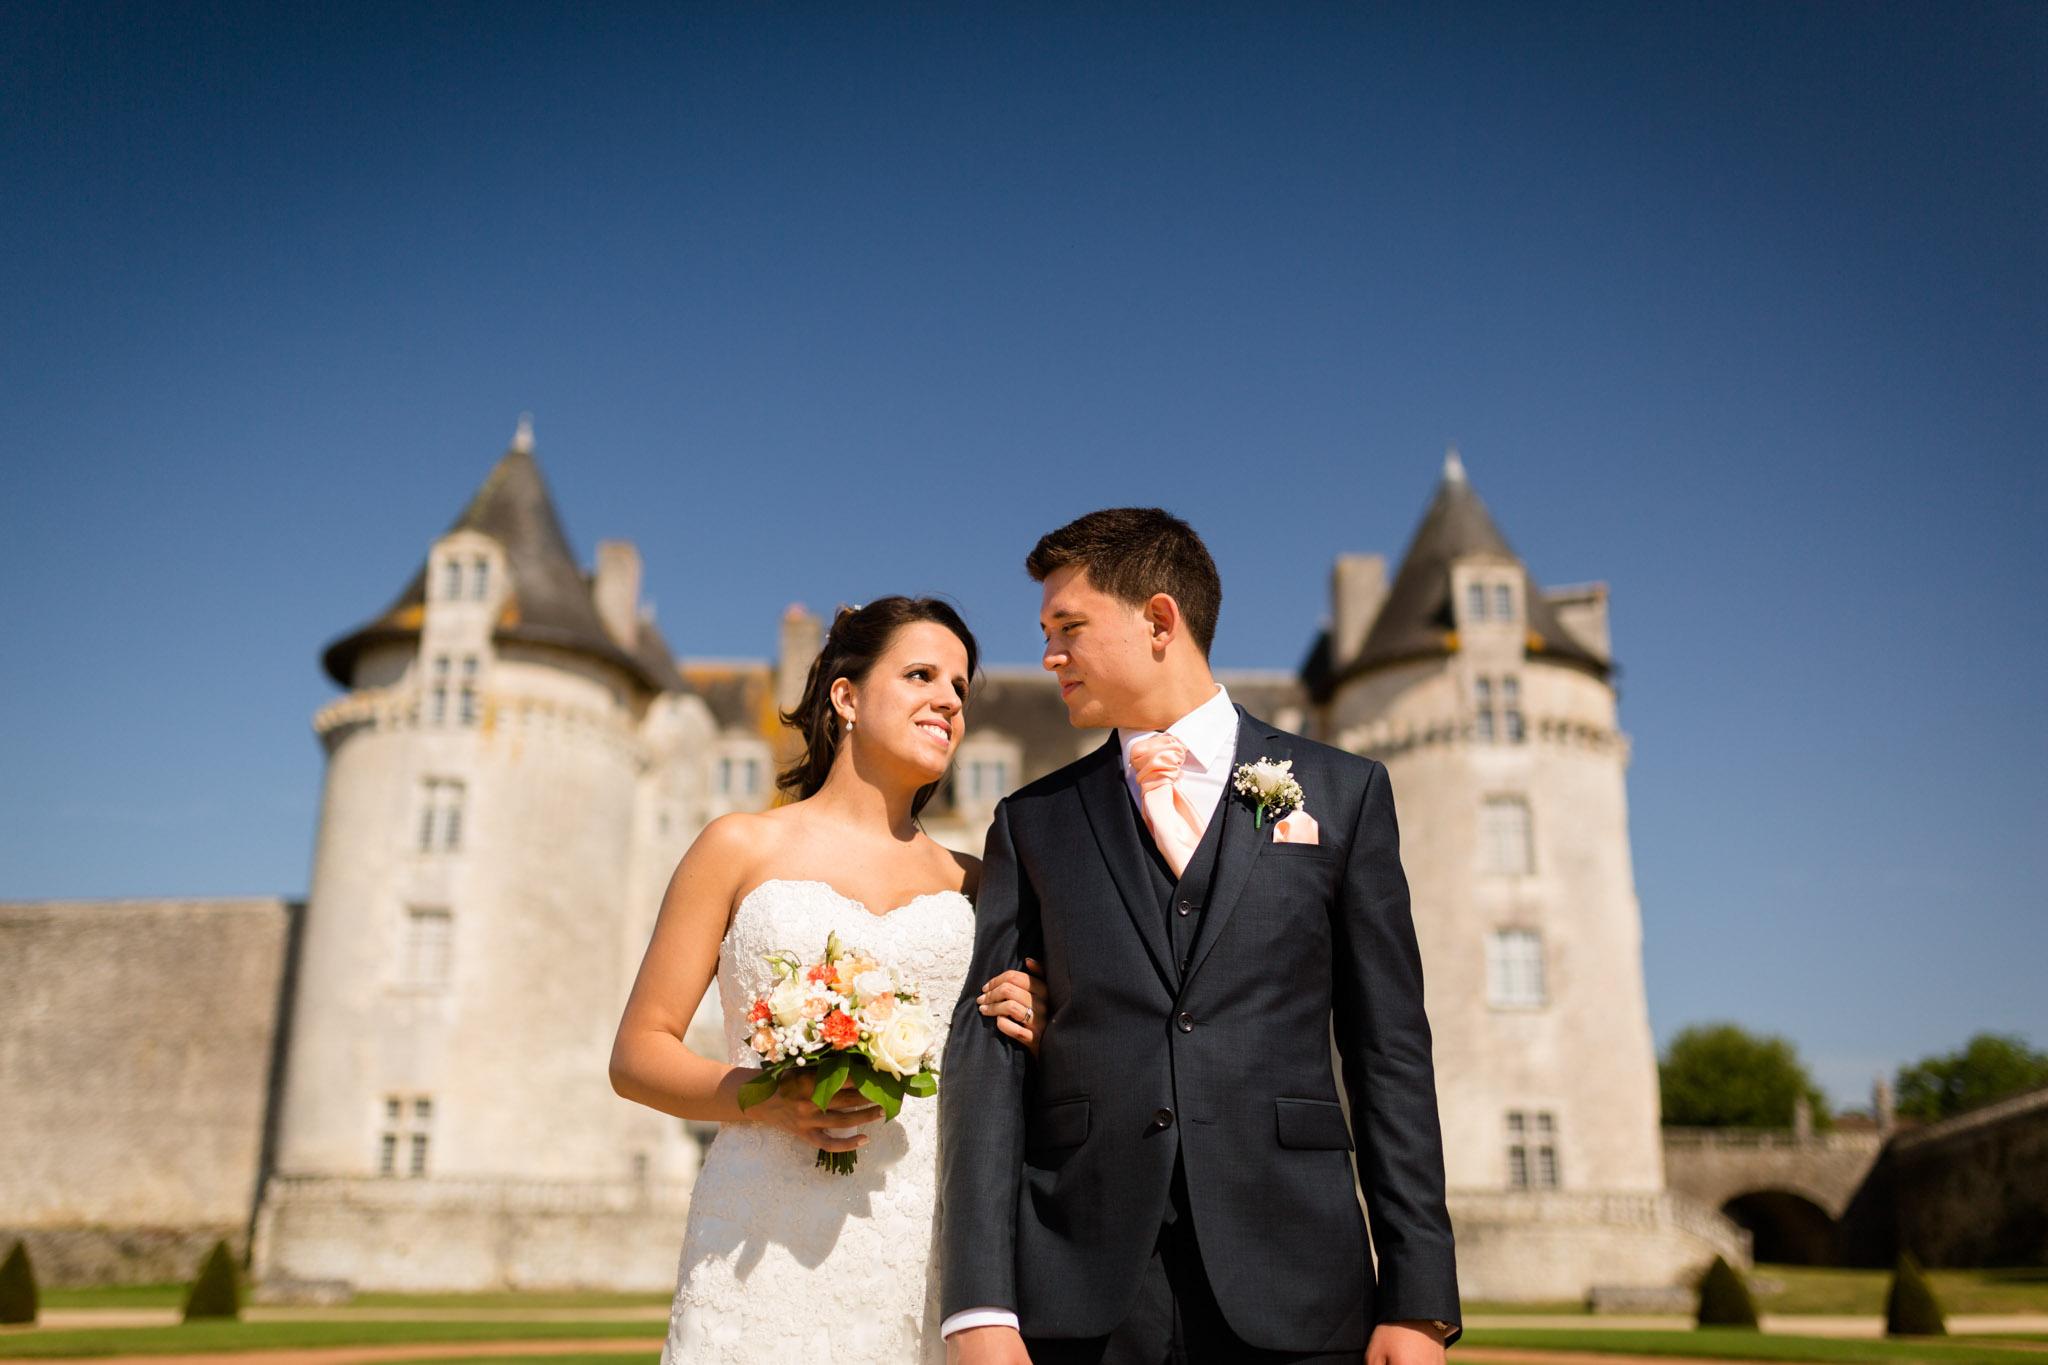 13_mariage-la-roche-courbon-charente